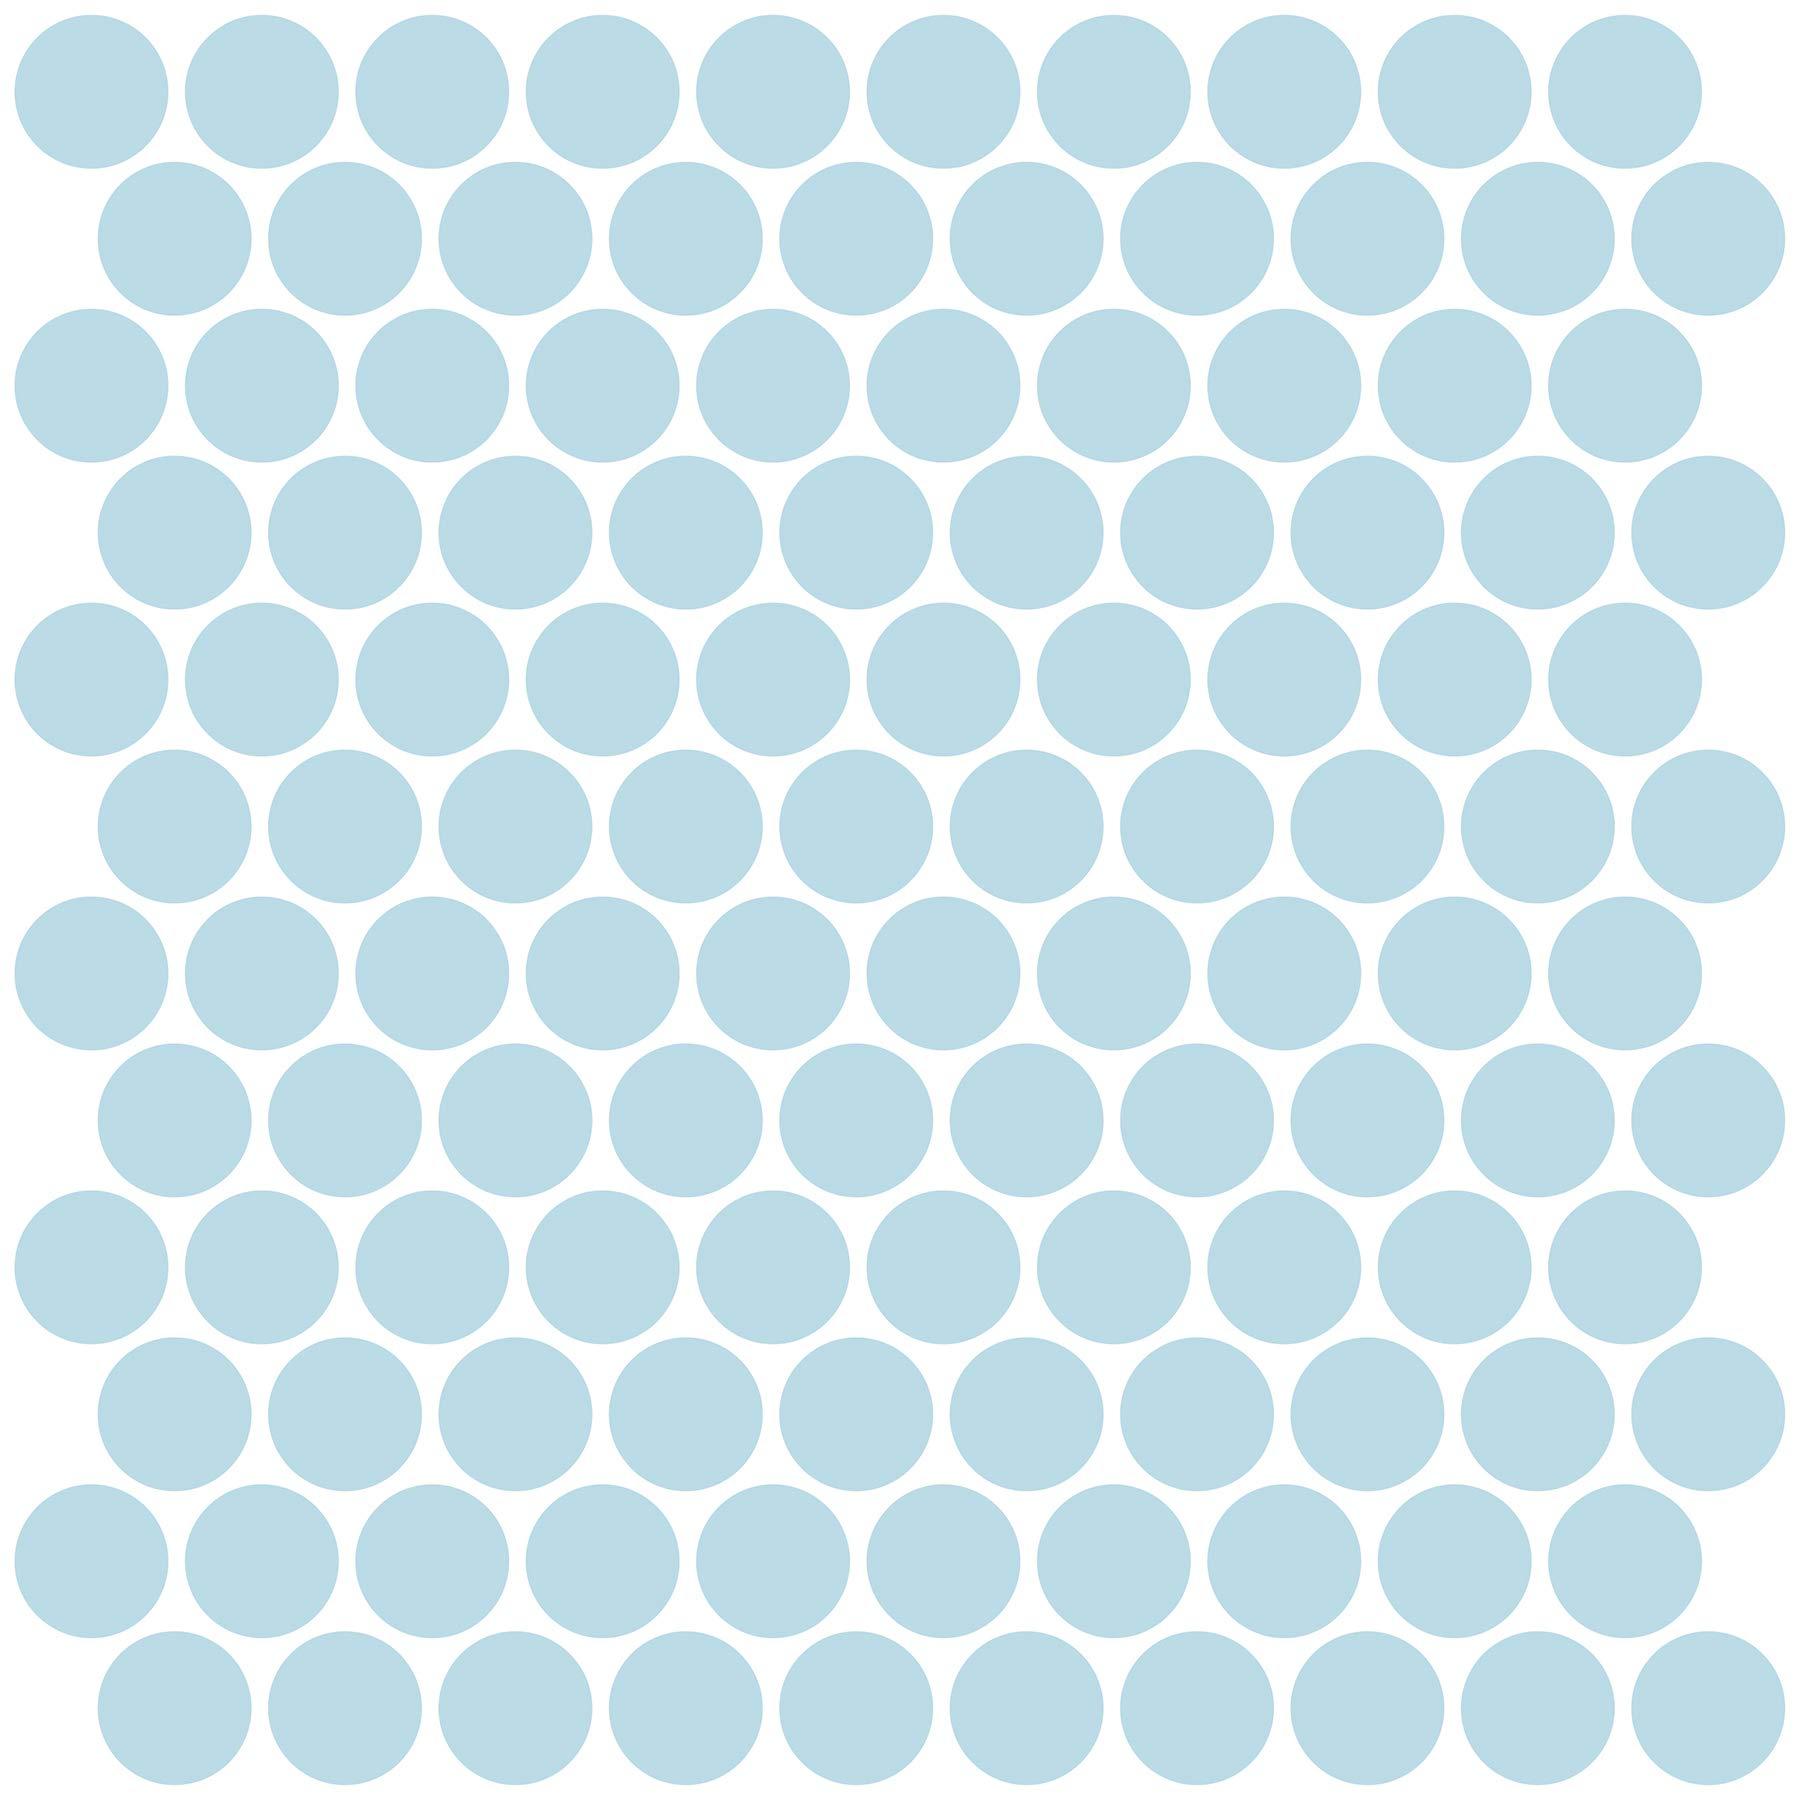 InHome NH2959 Penny Peel & Stick Backsplash Tiles, Blue